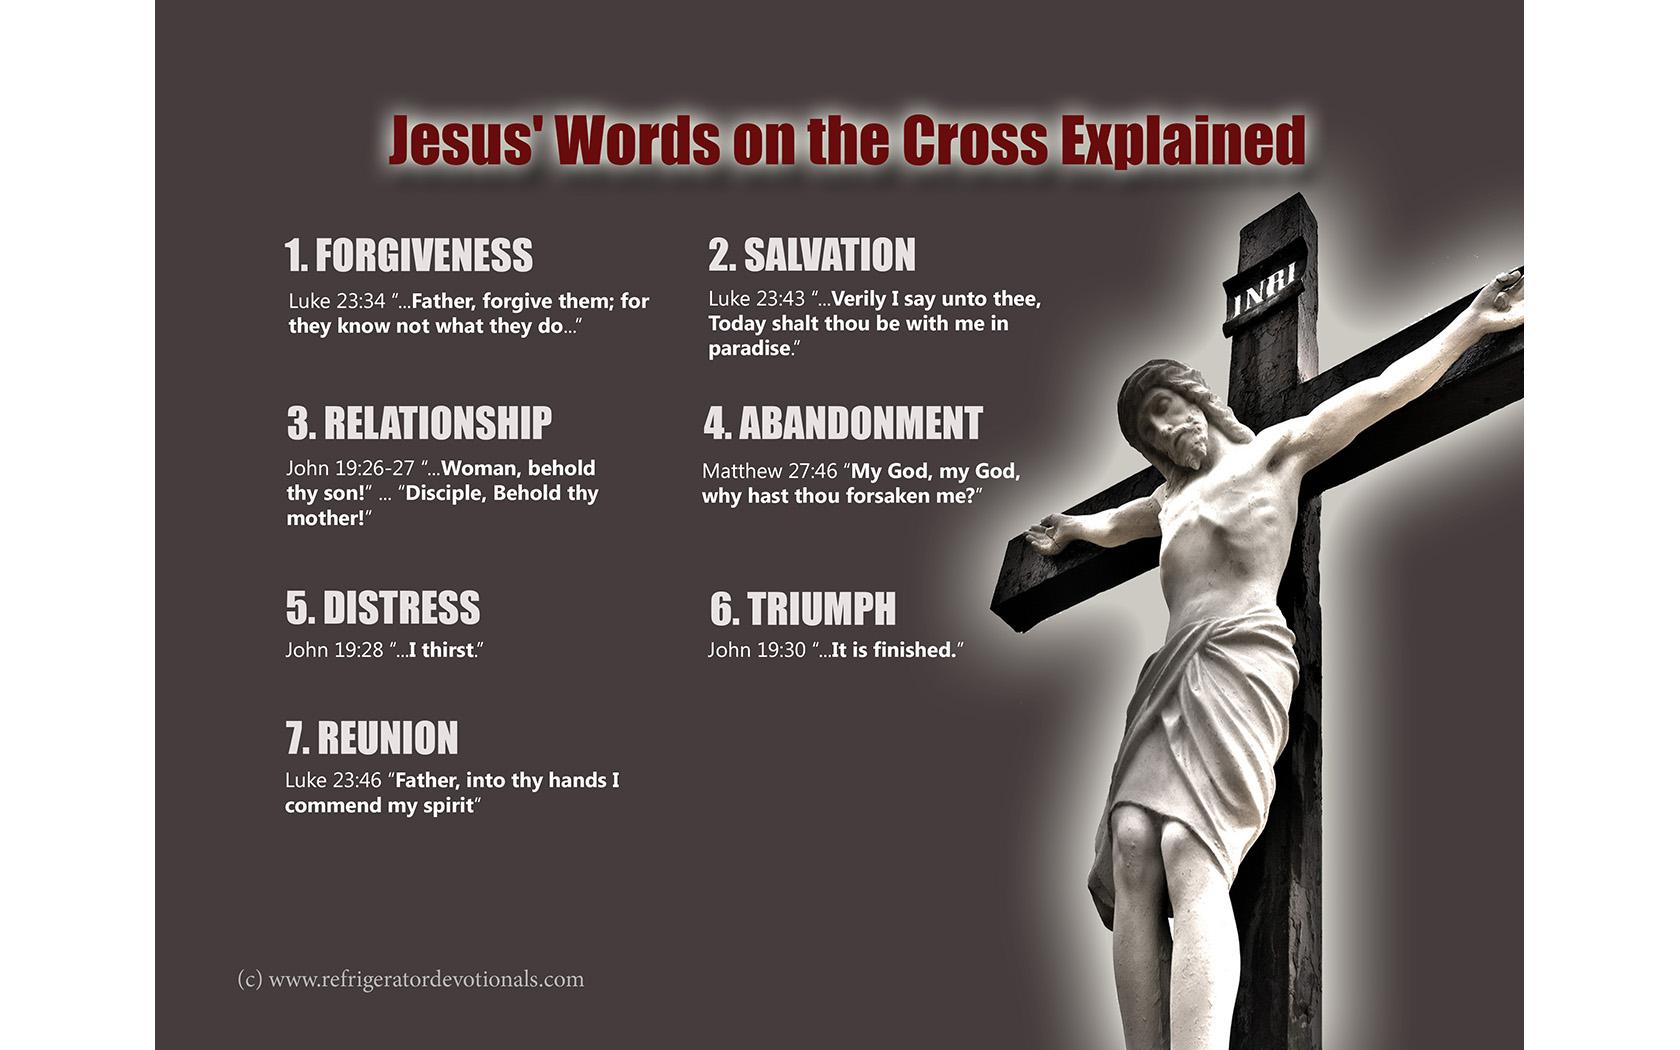 Visual Aid: Jesus' words on the cross | Refrigerator Devotionals